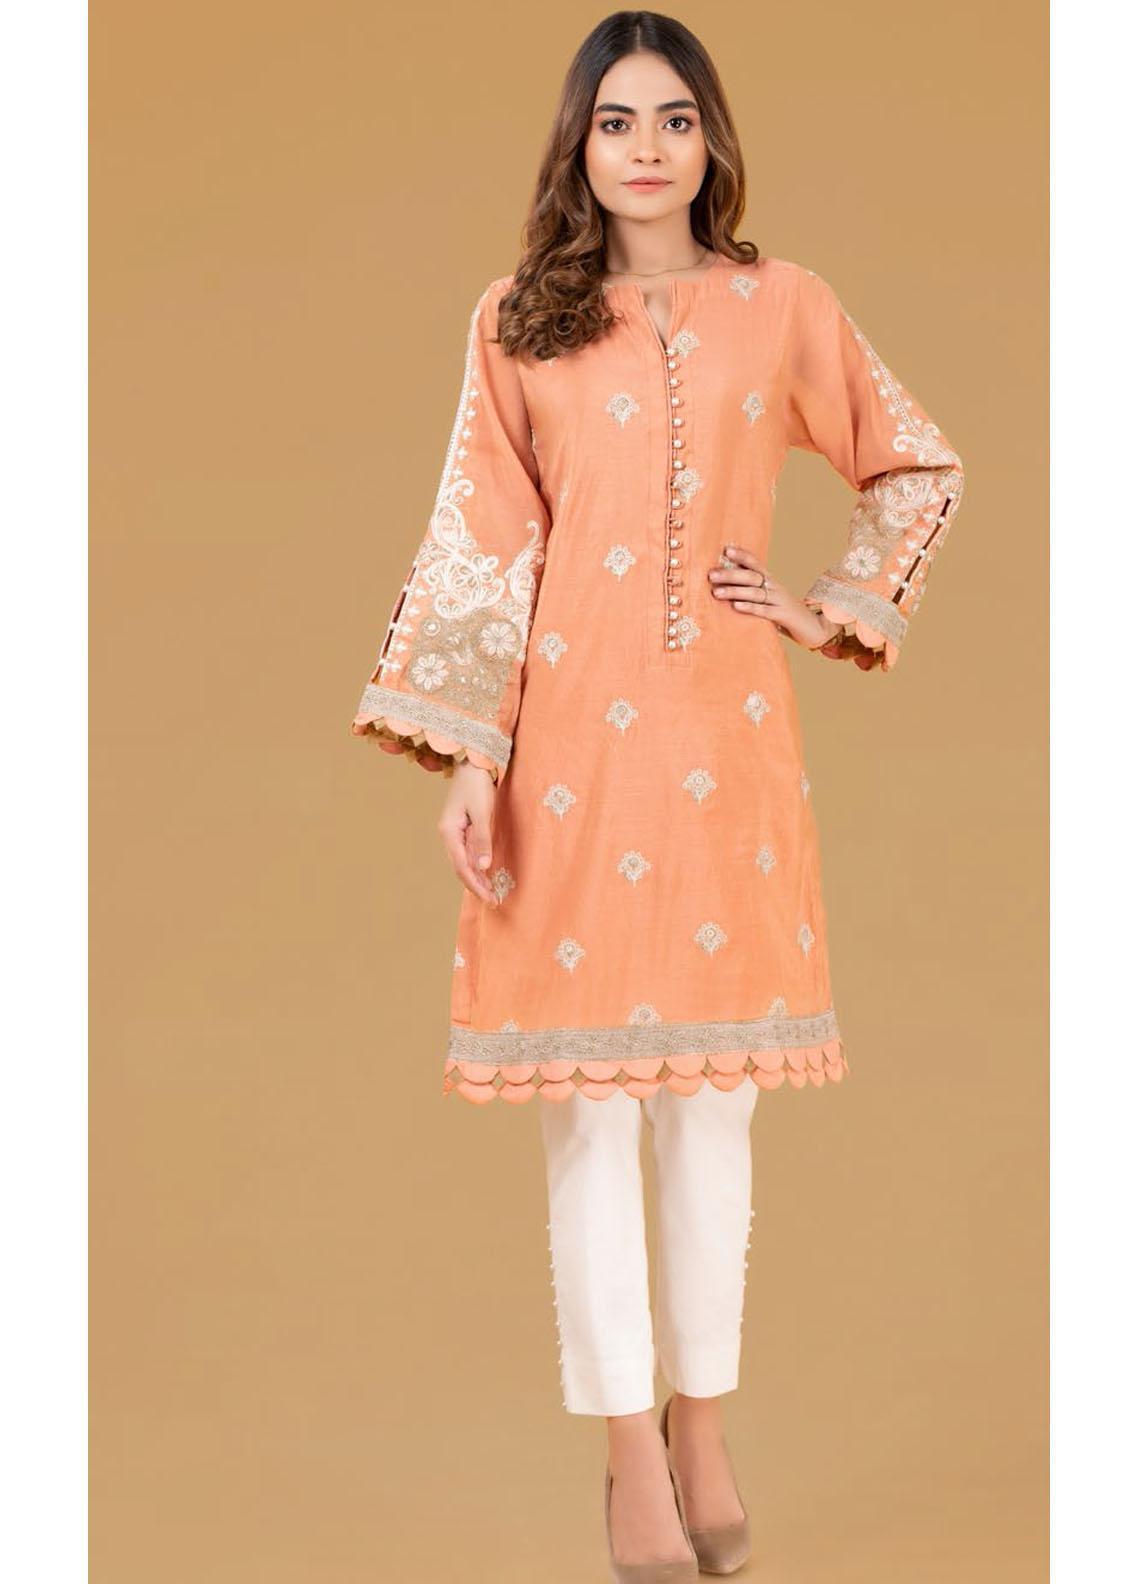 Gul Ahmed Luxury Pret Embroidered Cotton Kurties GA21K WGK-YDS-DE-417